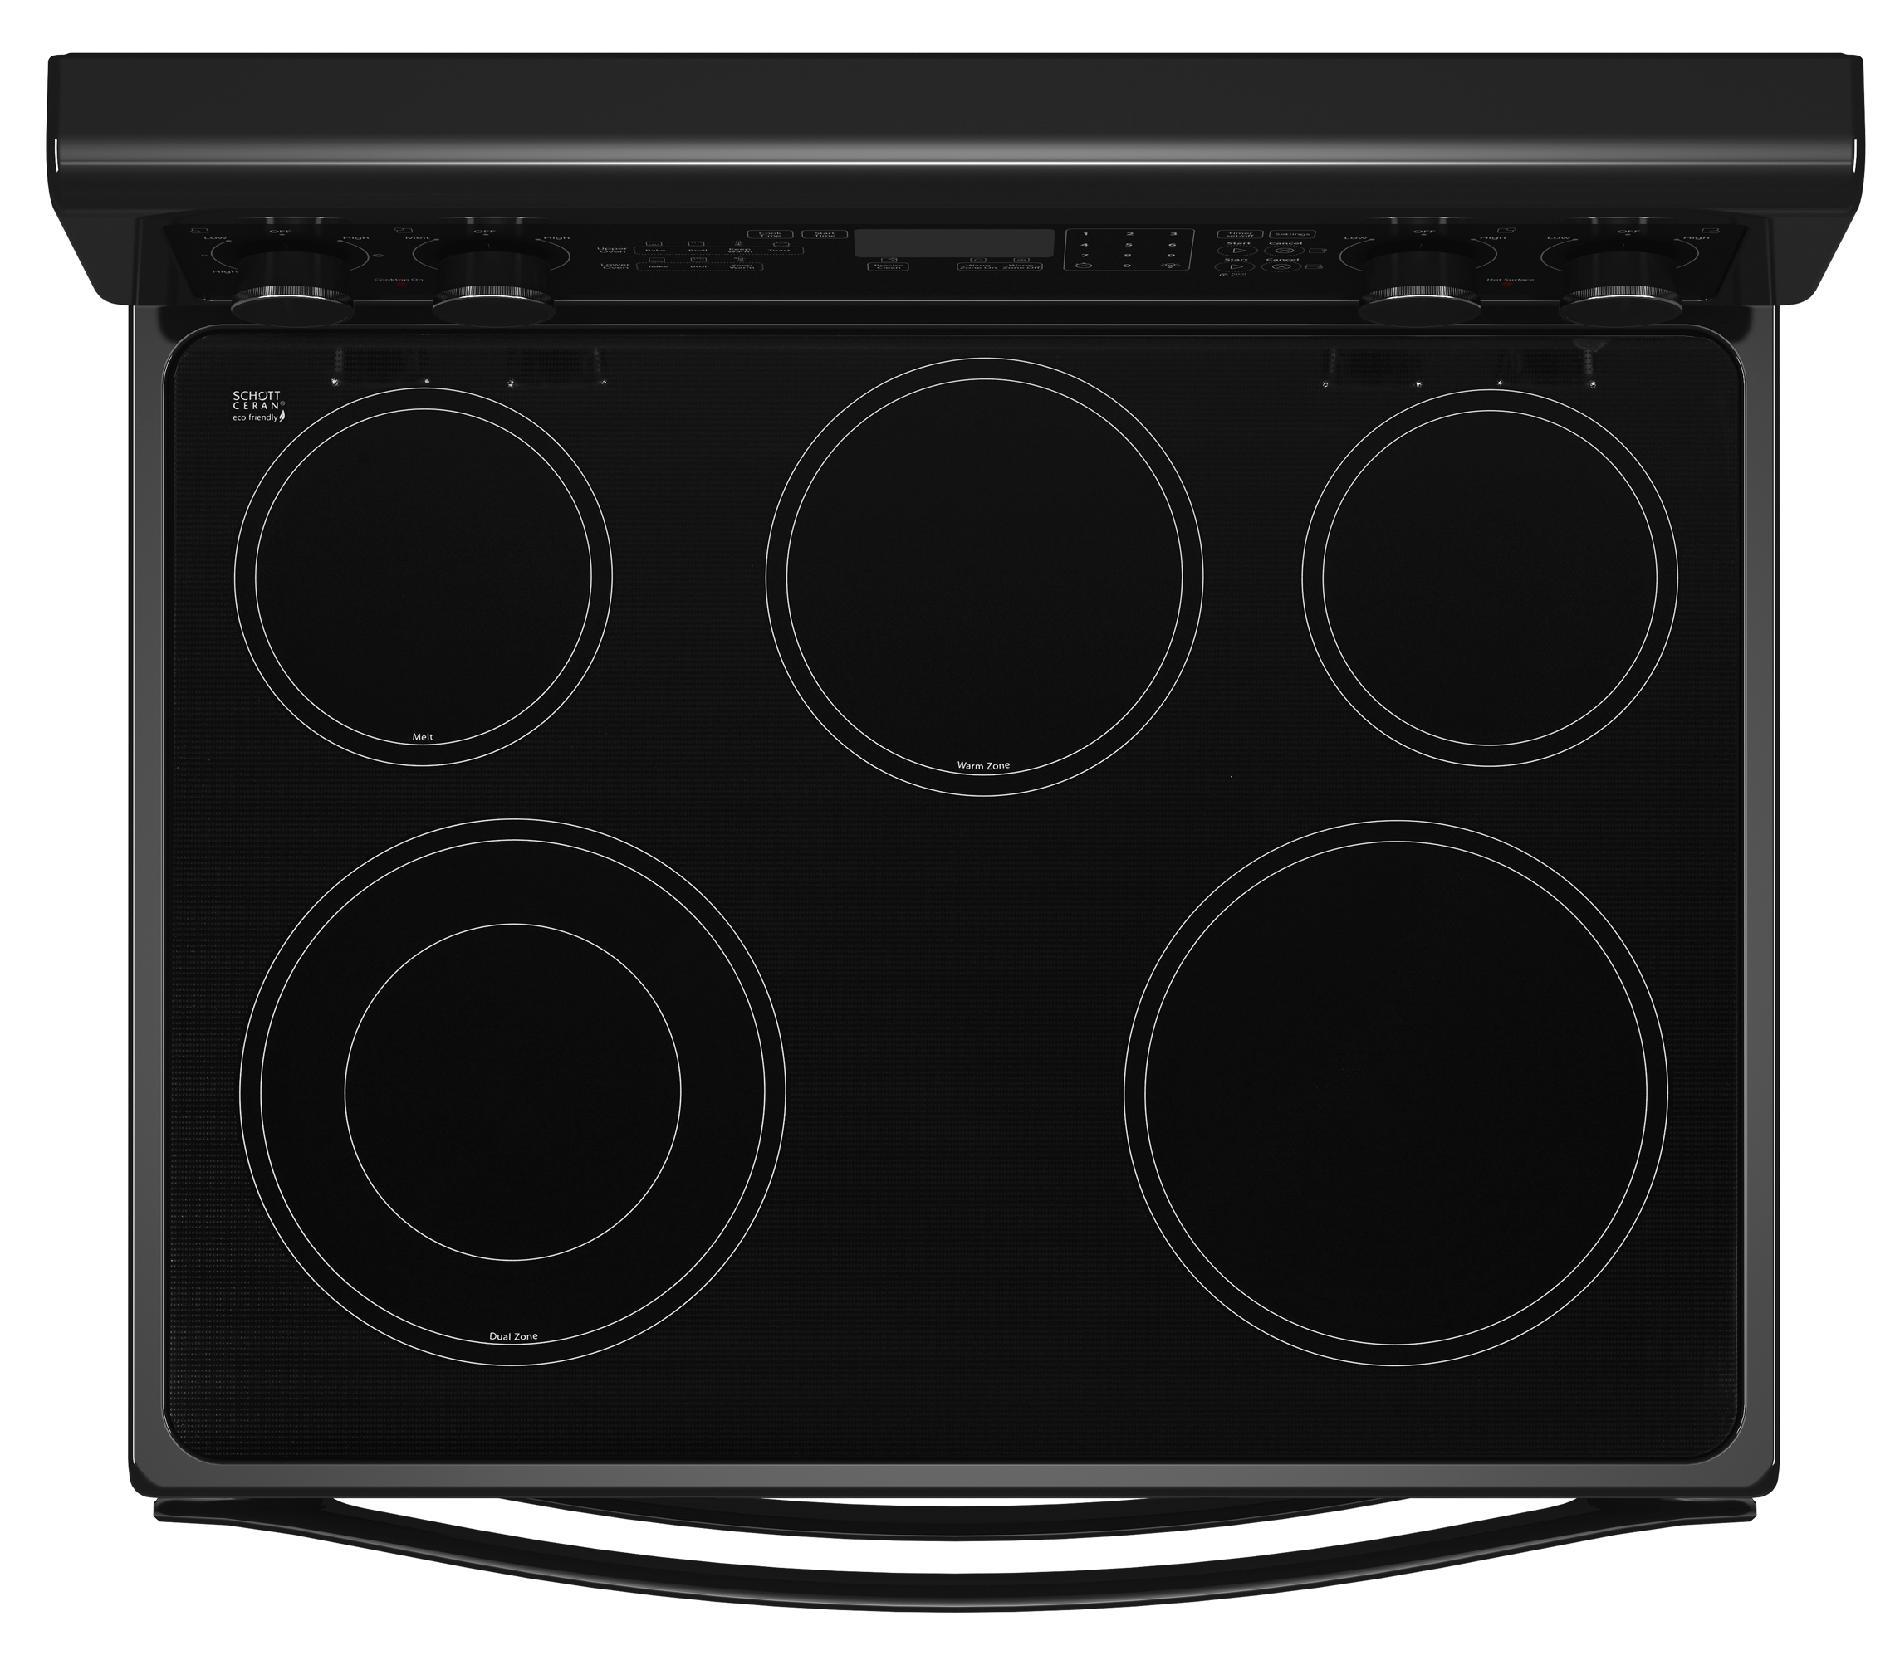 "Whirlpool WGE555S0BB 30"" Electric Range w/ AccuBake® System - Black"